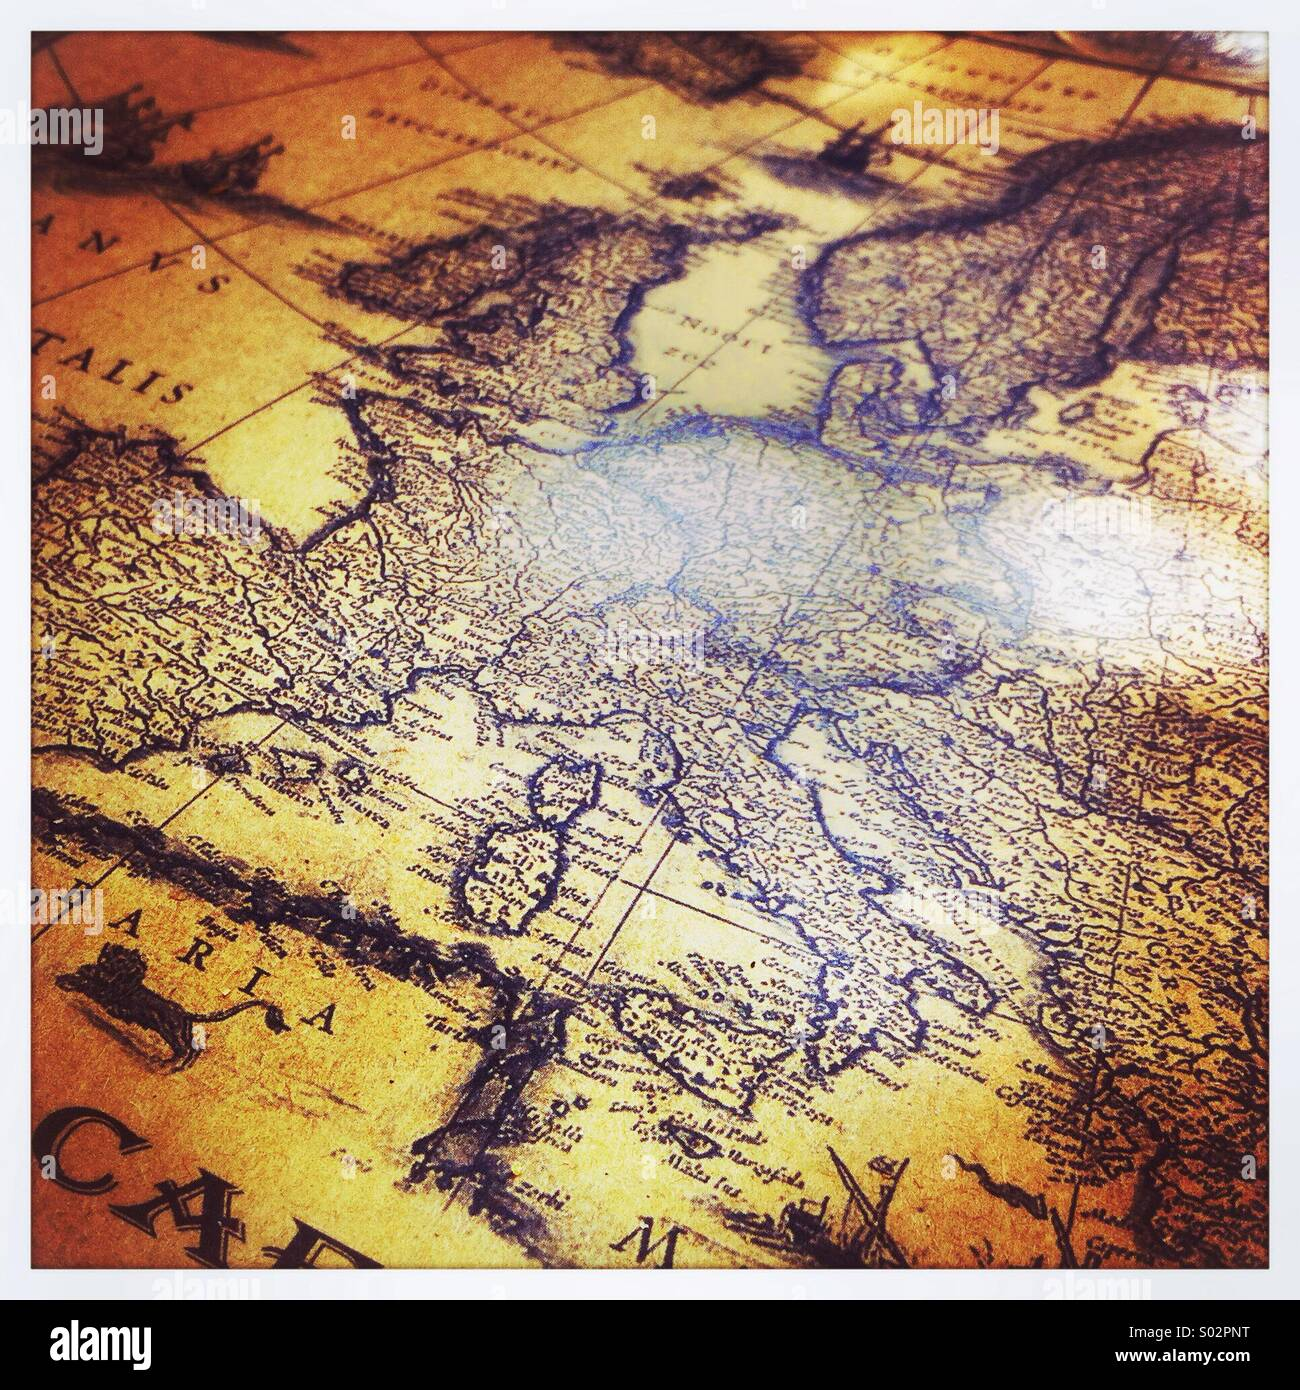 Mapa del mundo histórico Imagen De Stock